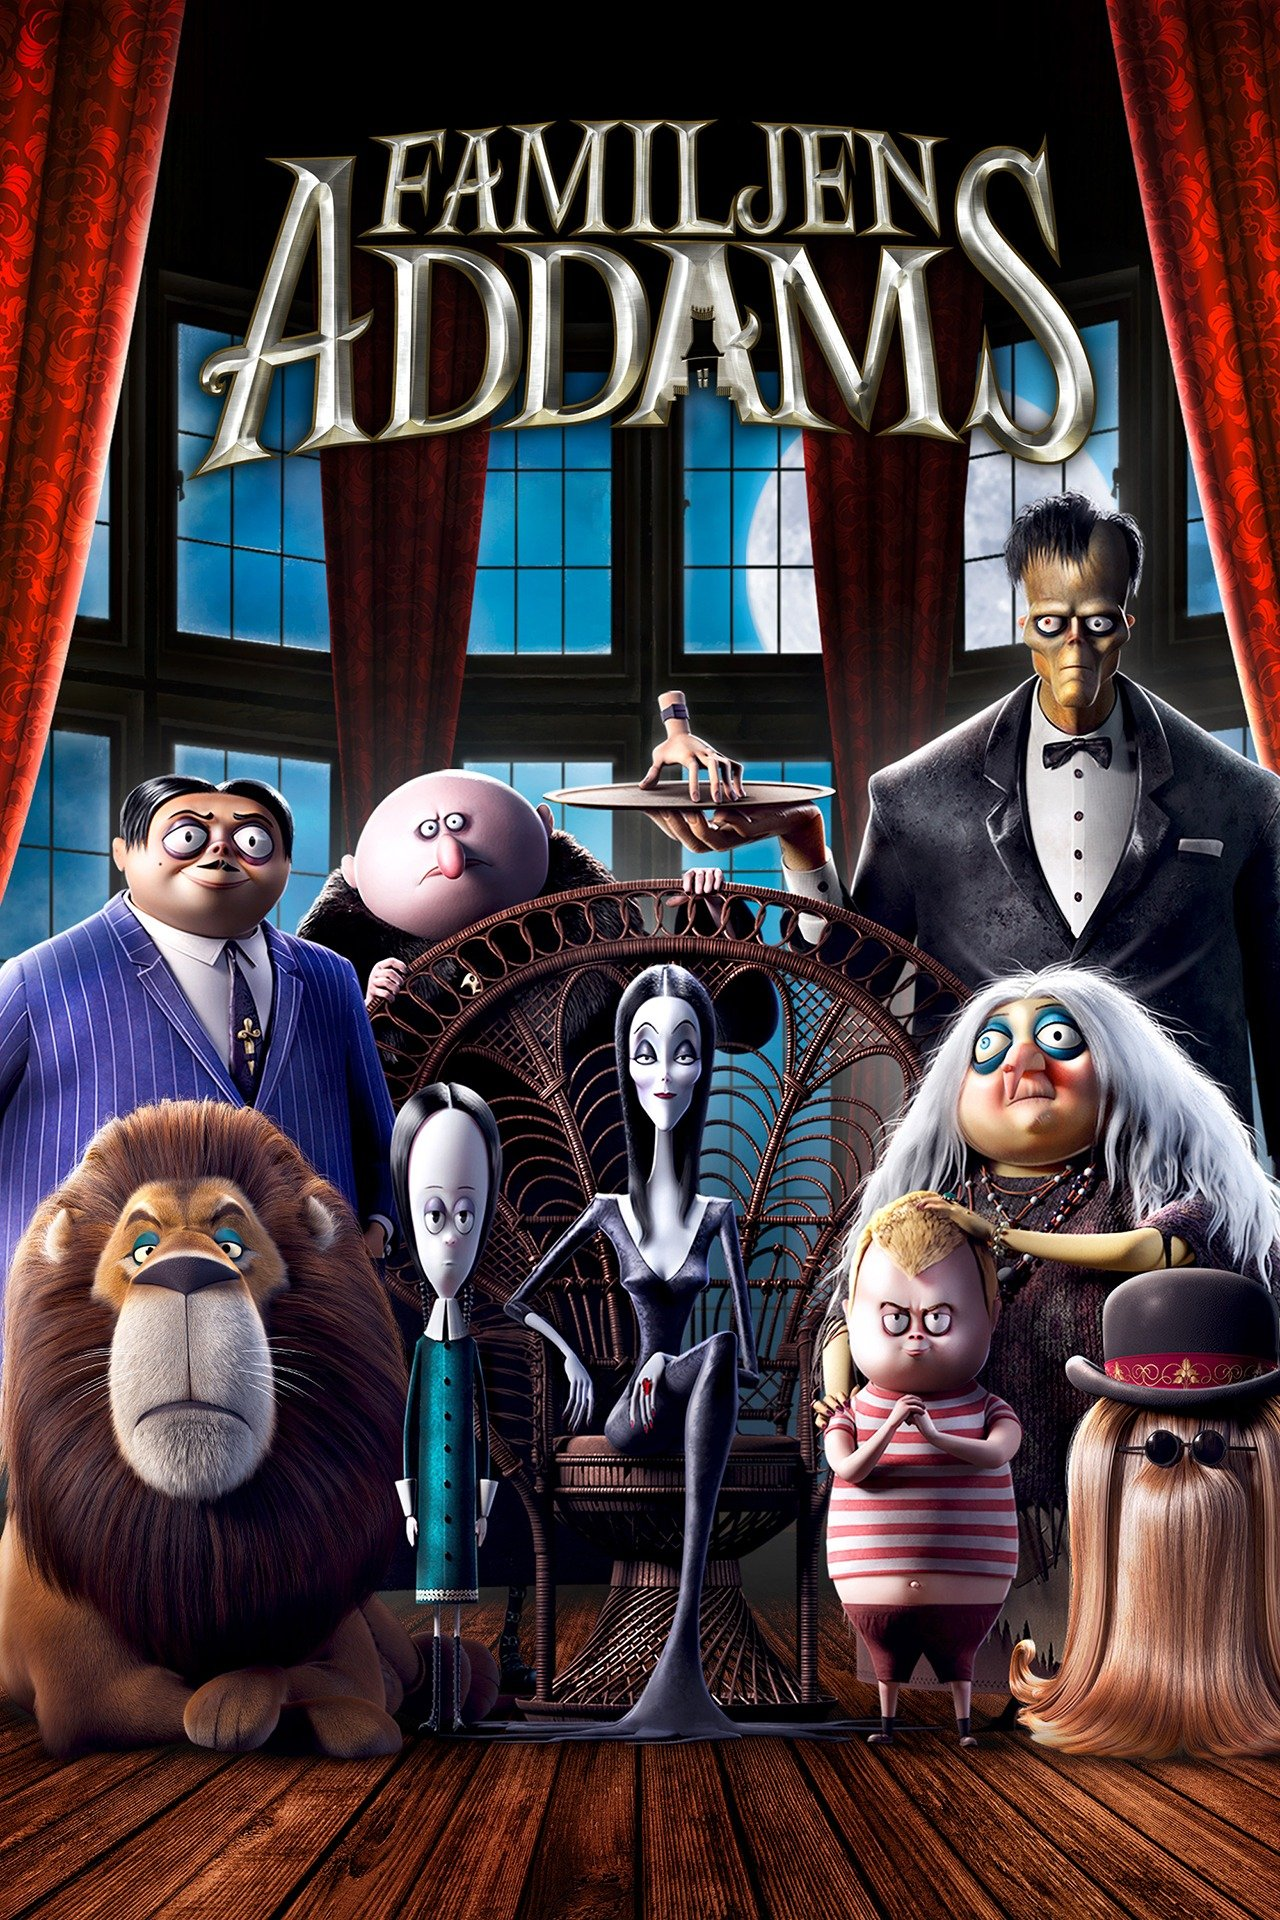 Familjen Addams